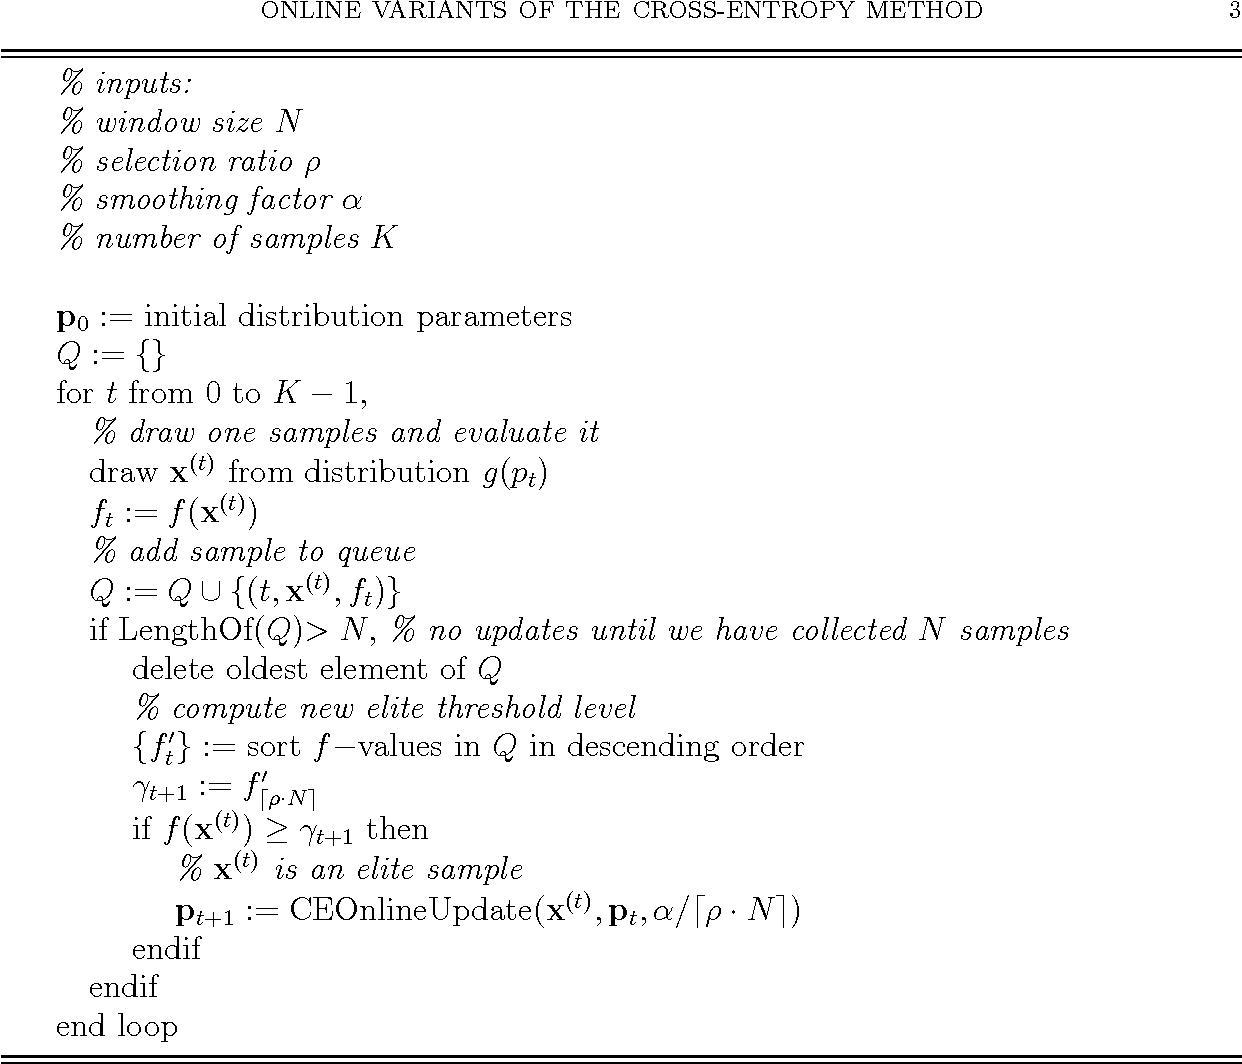 Figure 2 for Online variants of the cross-entropy method